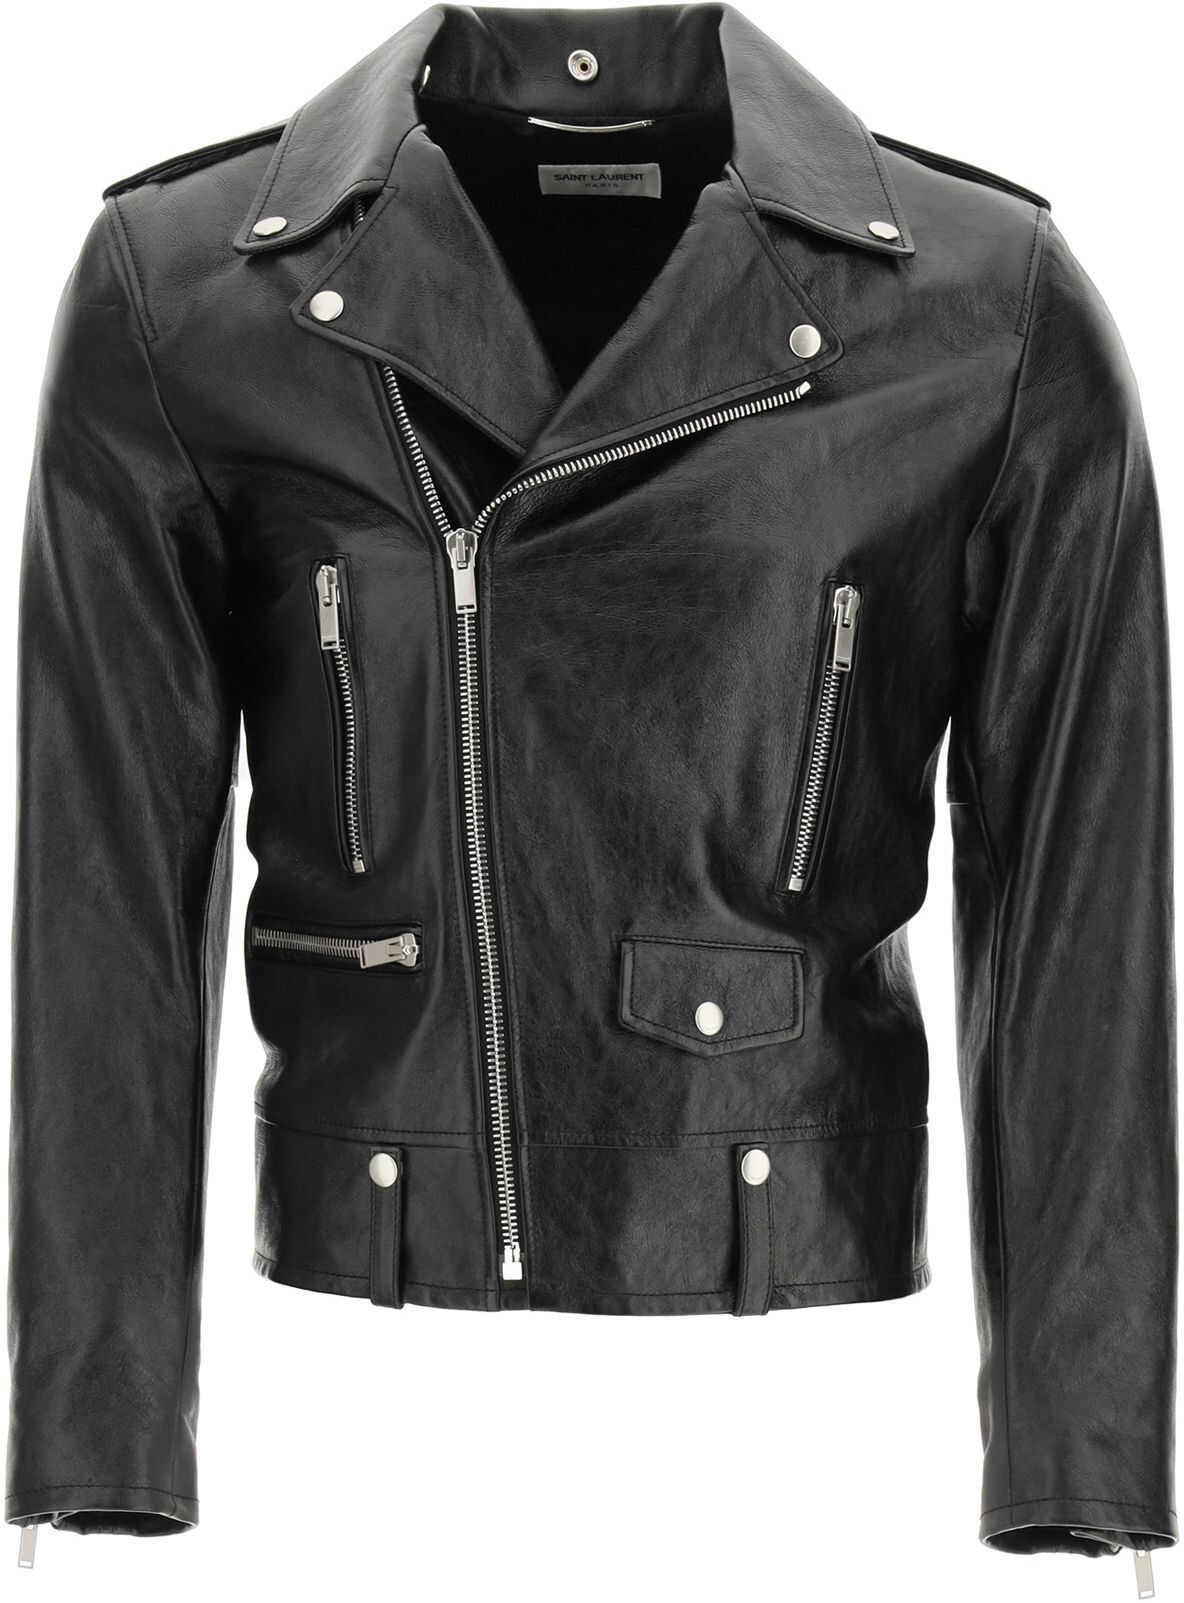 Saint Laurent Leather Biker Jacket BLACK imagine